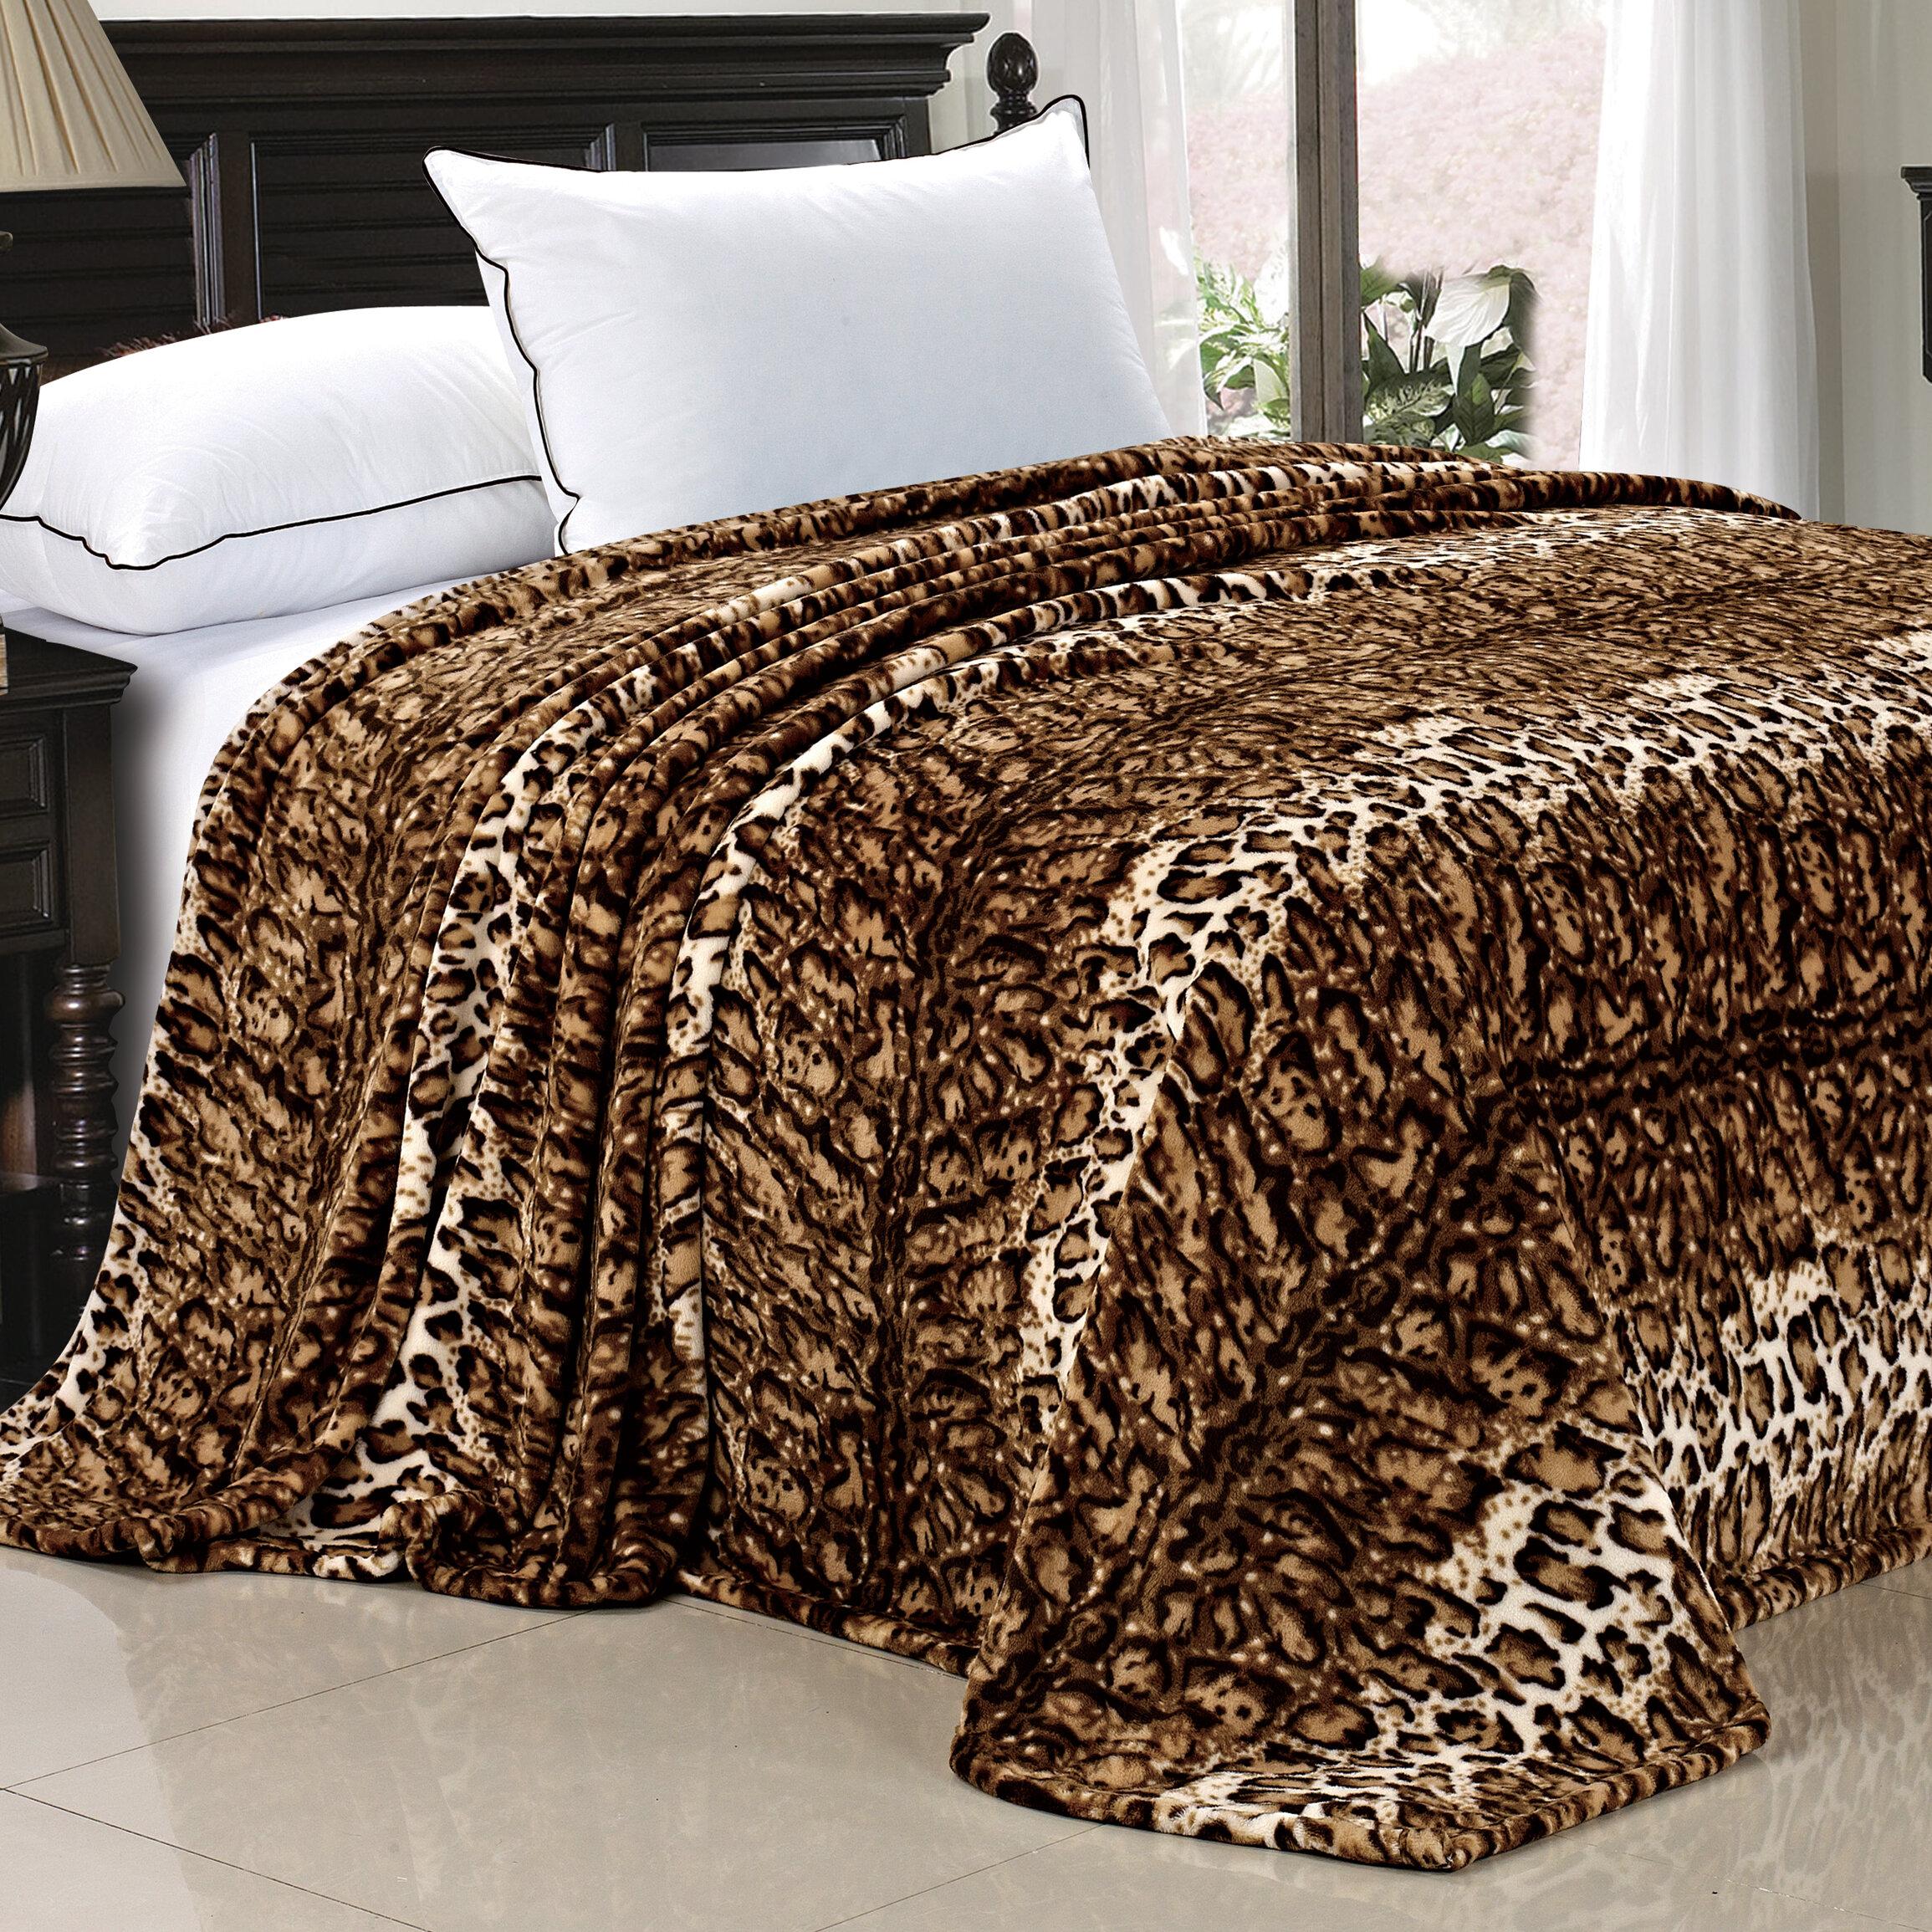 BOON Throw & Blanket Safari Flannel Fleece Blanket & Reviews | Wayfair